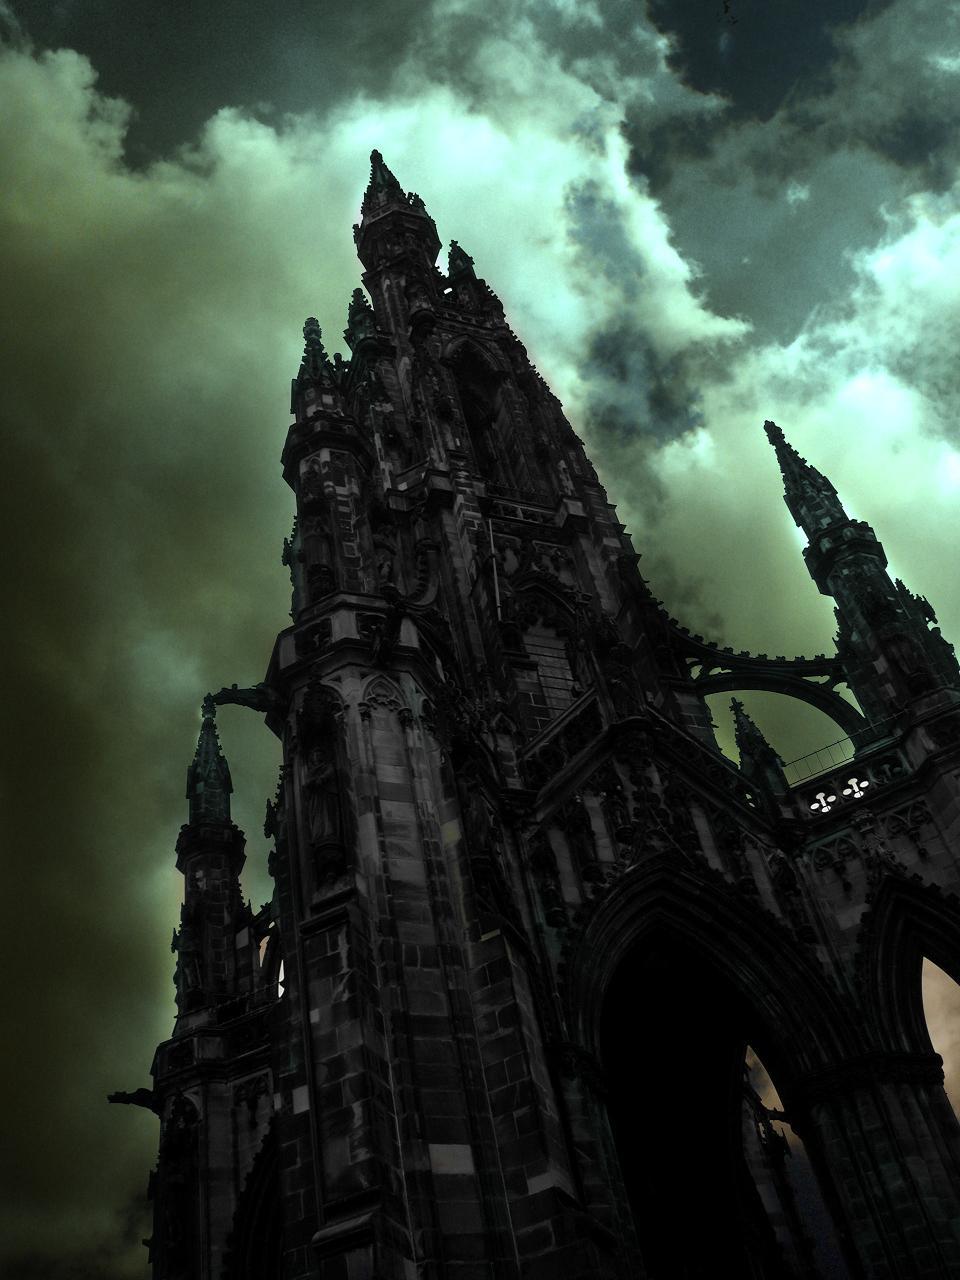 Black Tower By Twiggy101